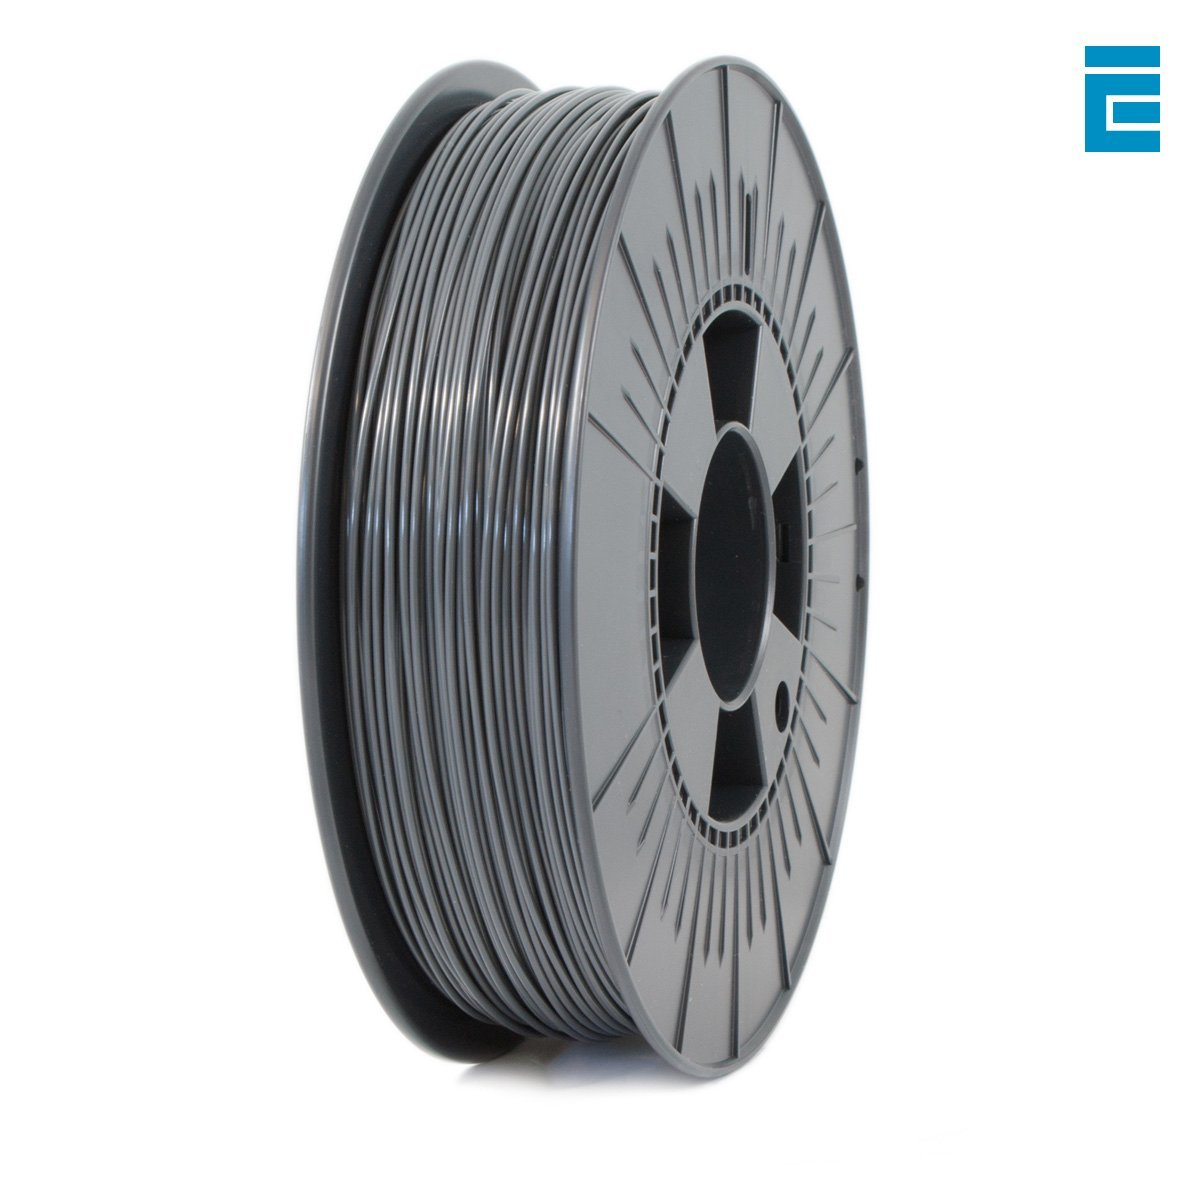 Ice Filaments ICEFIL1PLA015 Filamento PLA 1.75mm, 0.75kg, Grigio Dutch Filaments